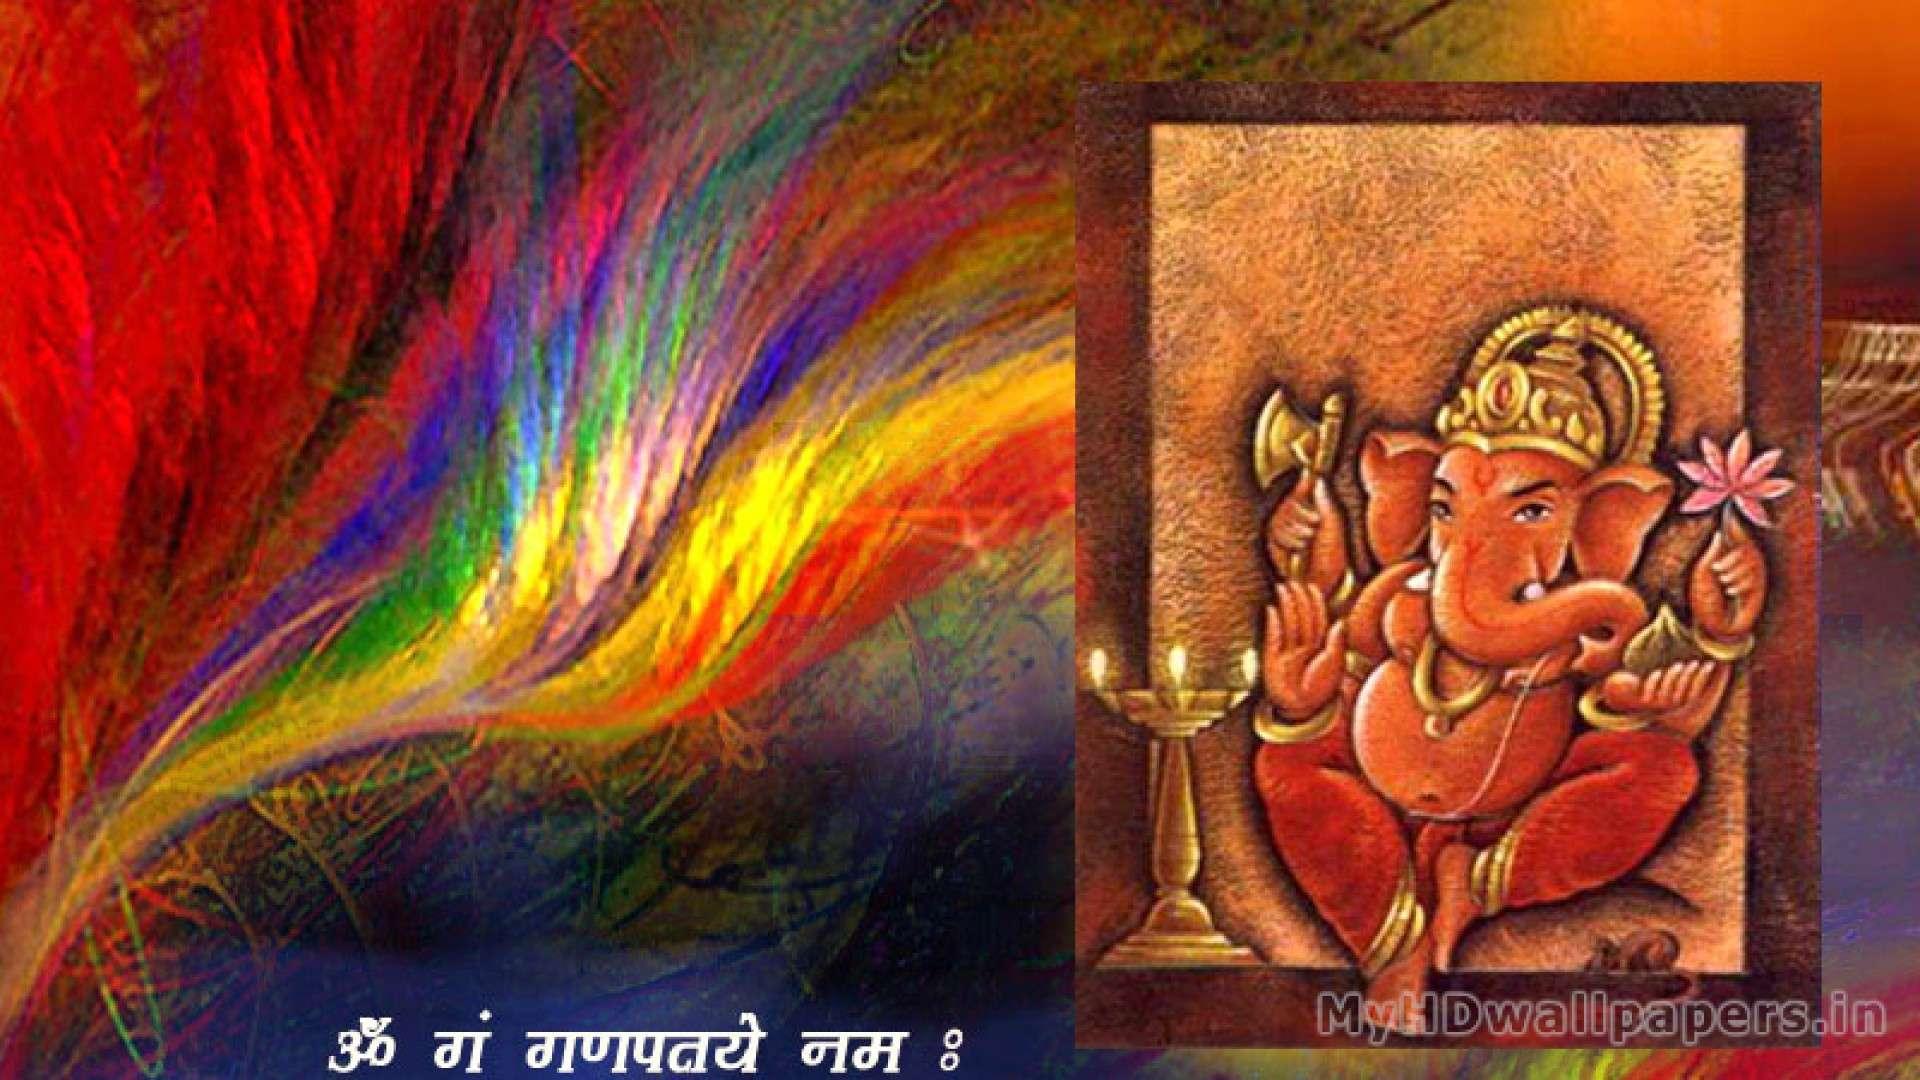 Lord Ganesha Hd Images Free Downloads For Wedding Cards: Ganesha Wallpapers For Desktop